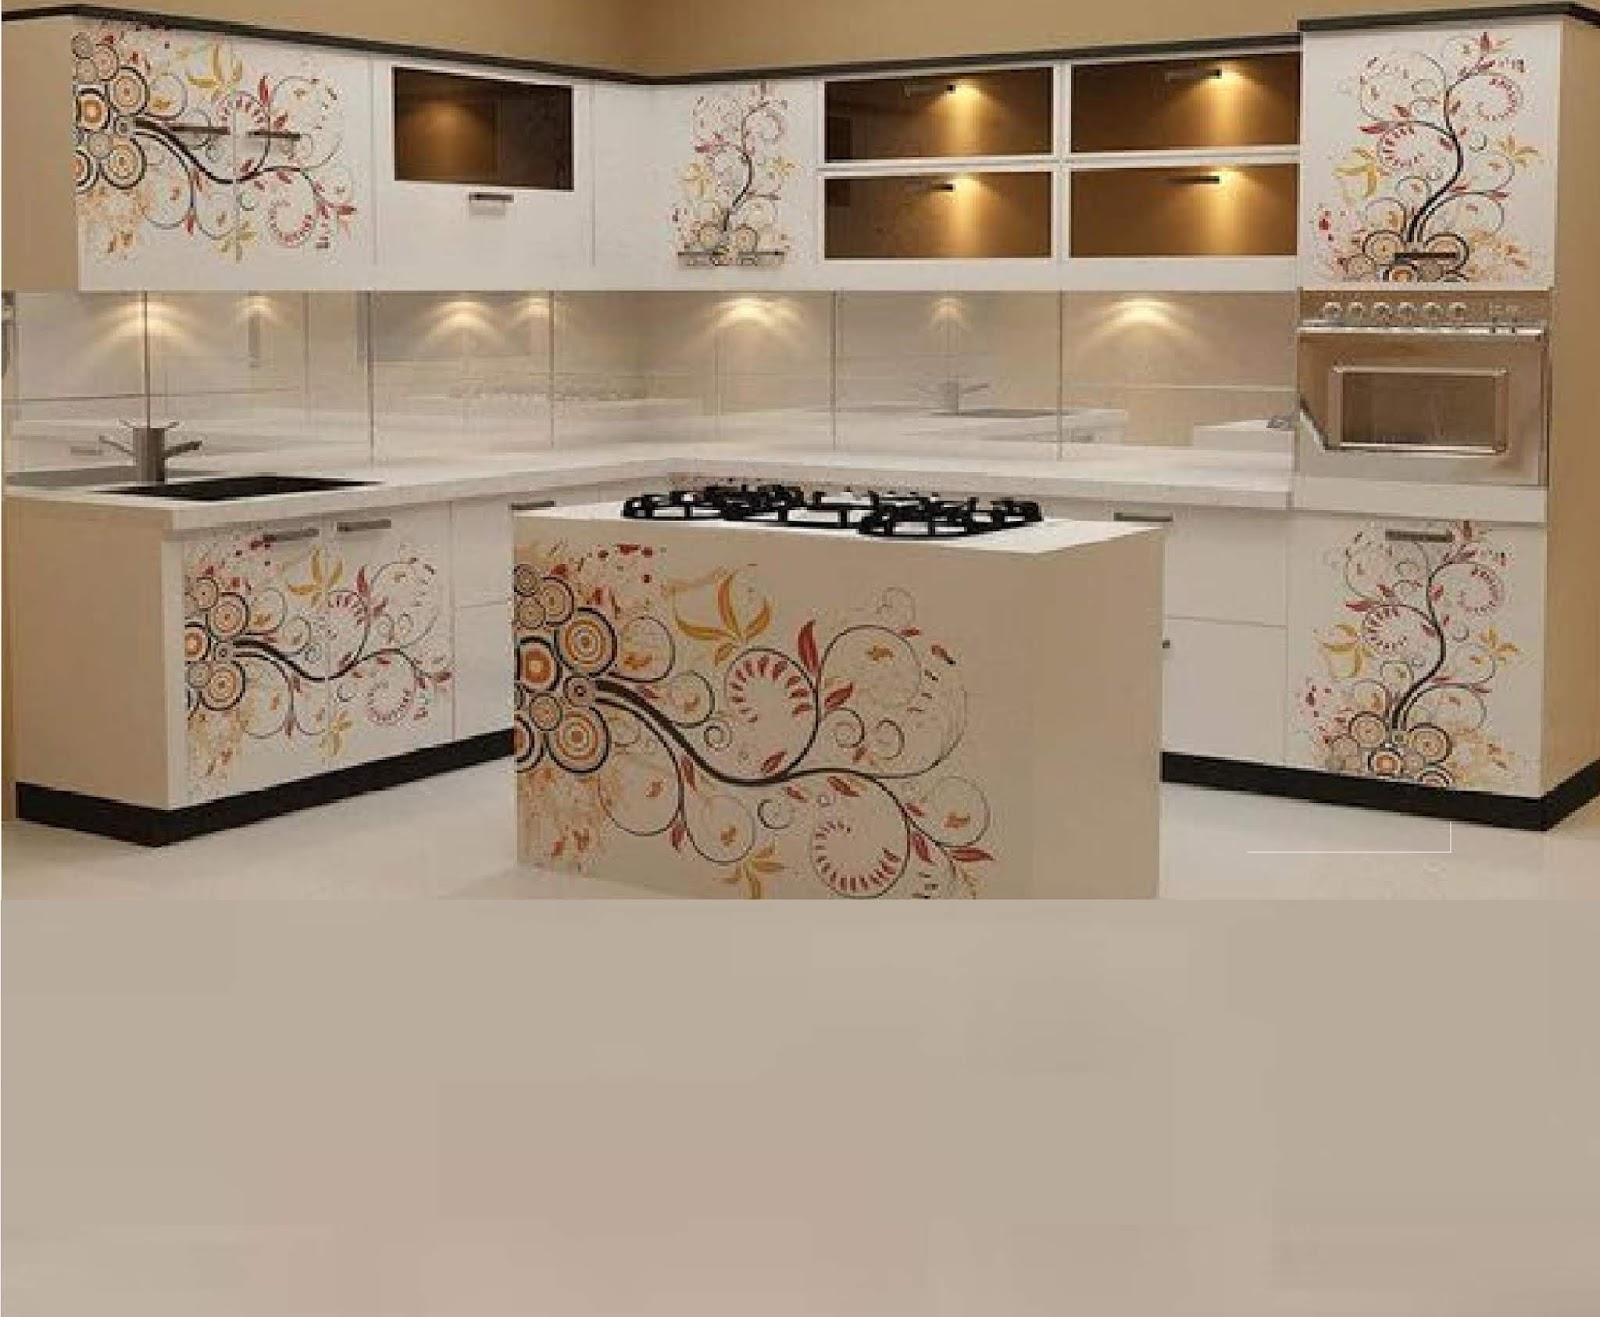 200 Modular kitchen design ideas catalogue 2020